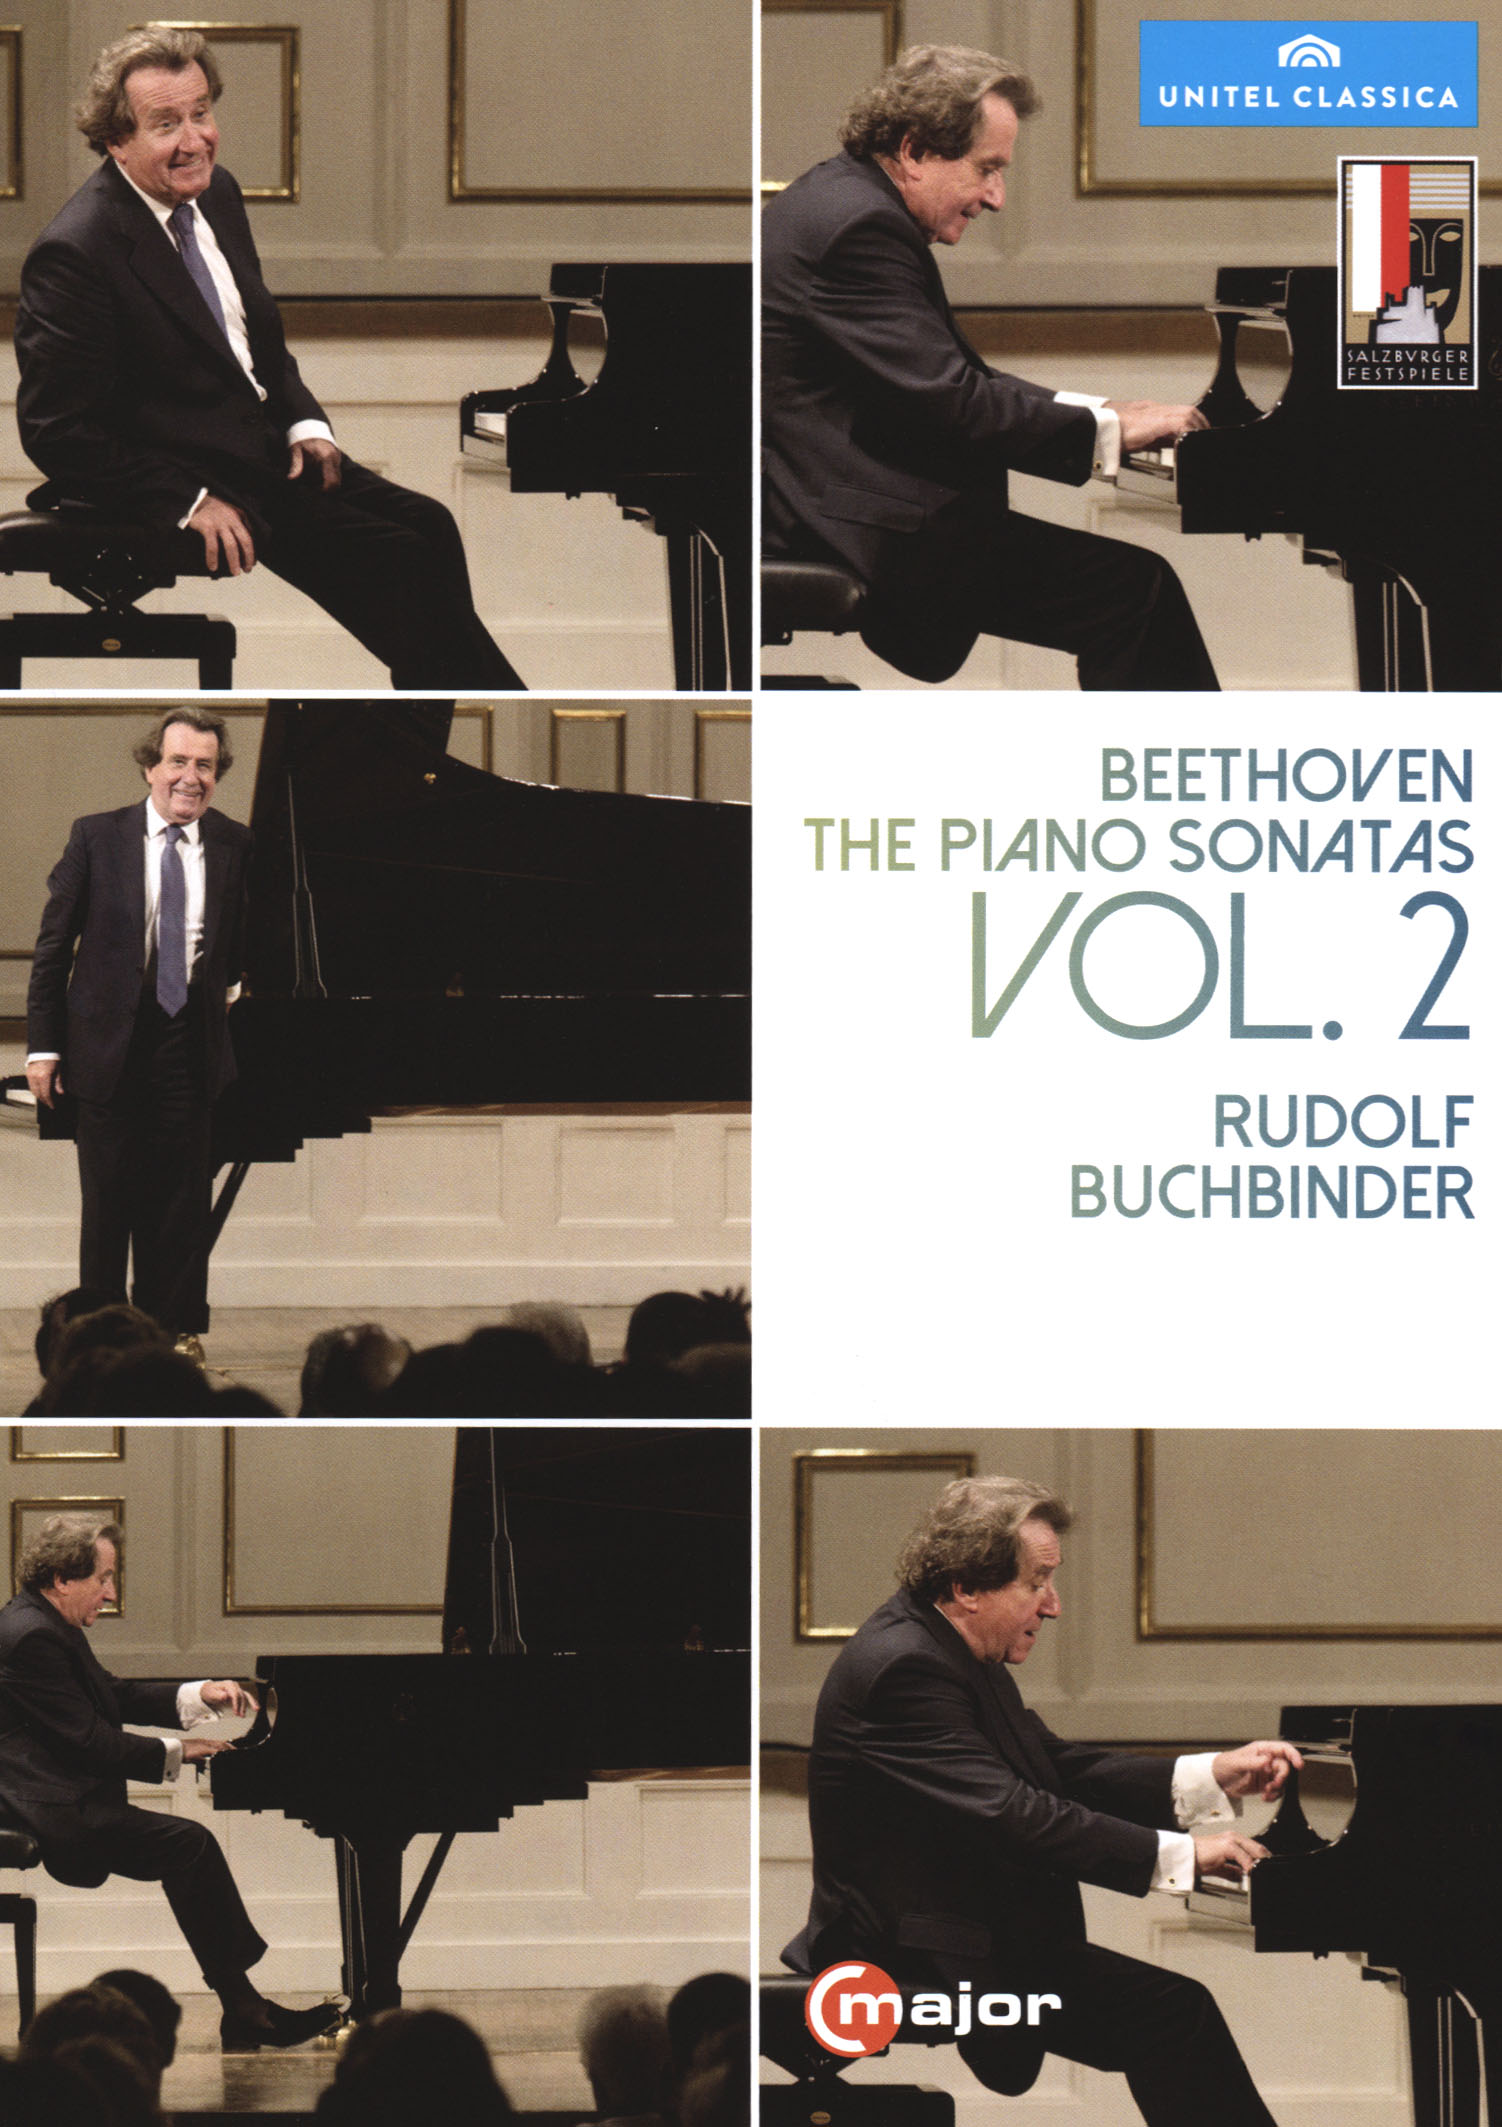 Rudolf Buchbinder: Beethoven - The Piano Sonatas Vol. 2